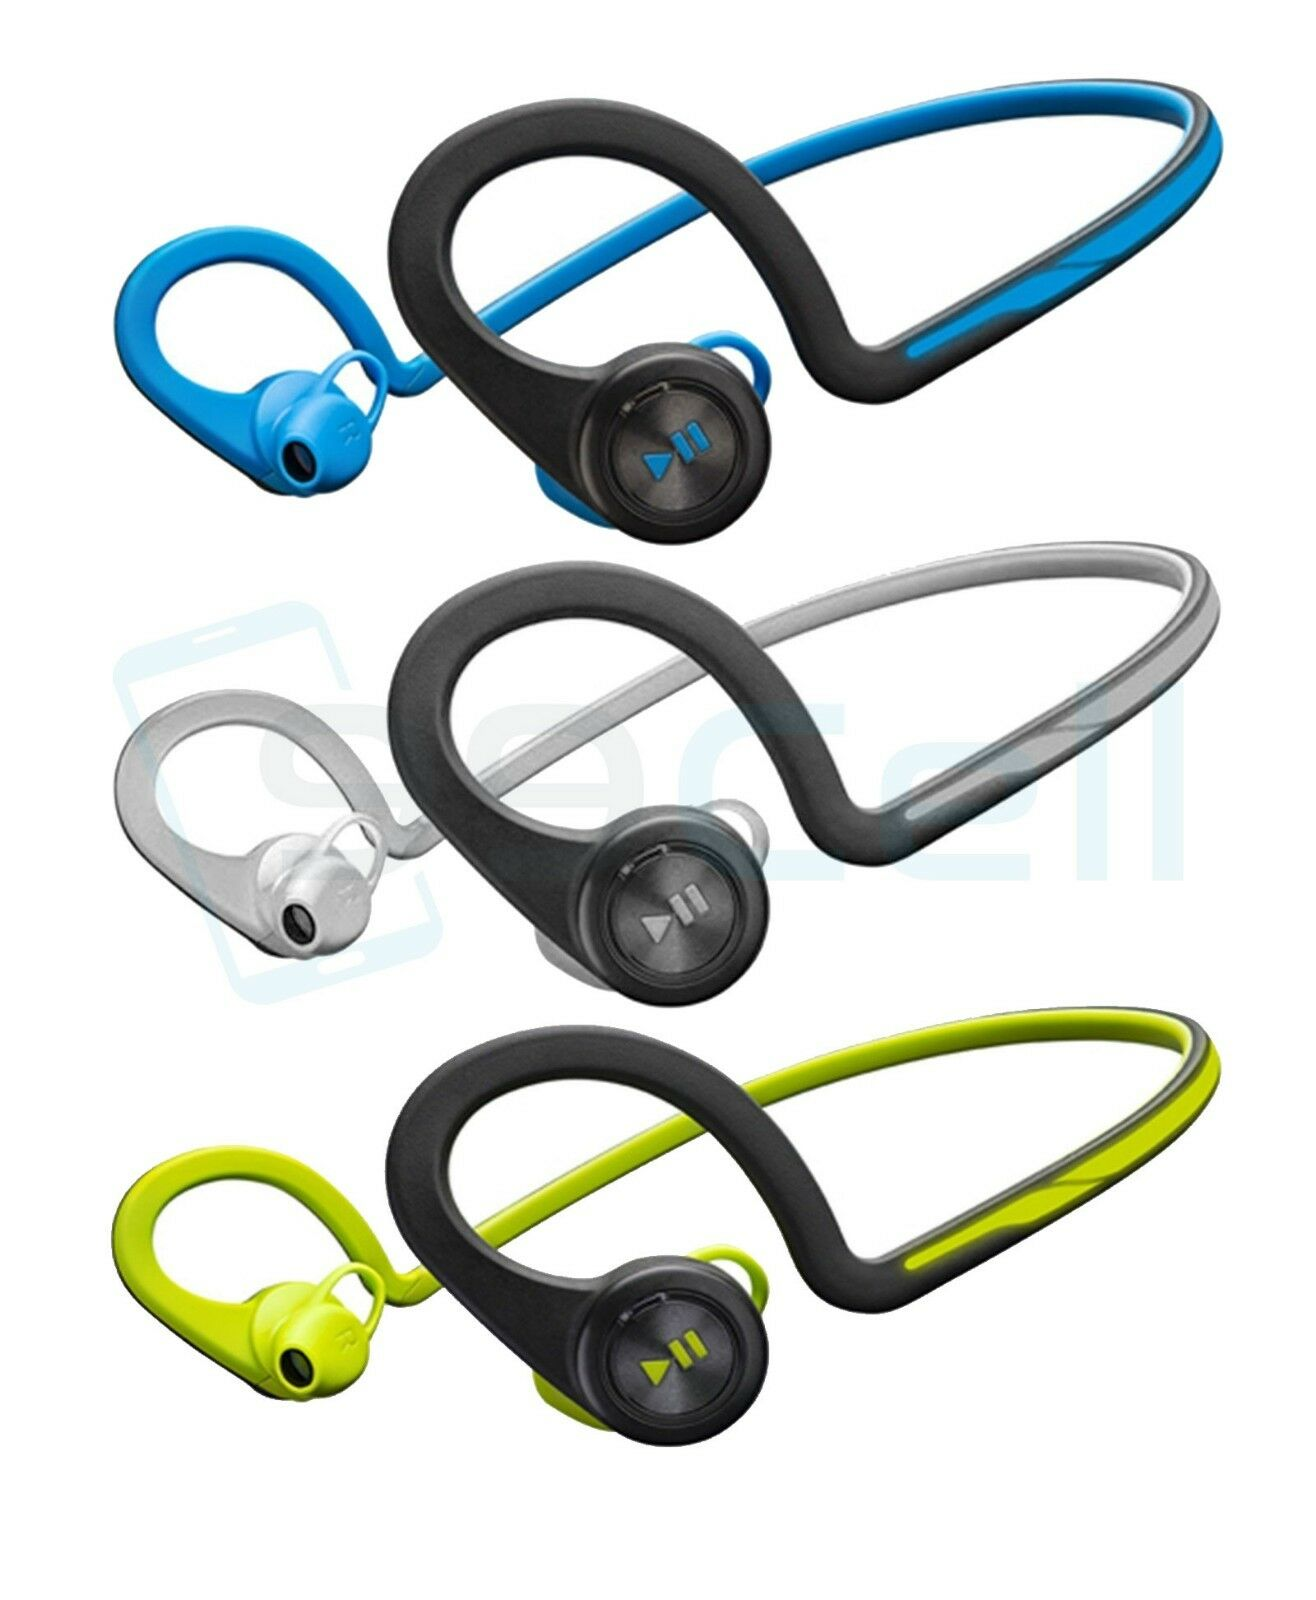 timeless design 34cd3 ae6c1 Details about Plantronics BackBeat FIT Waterproof Sport Wireless Bluetooth  Headphones